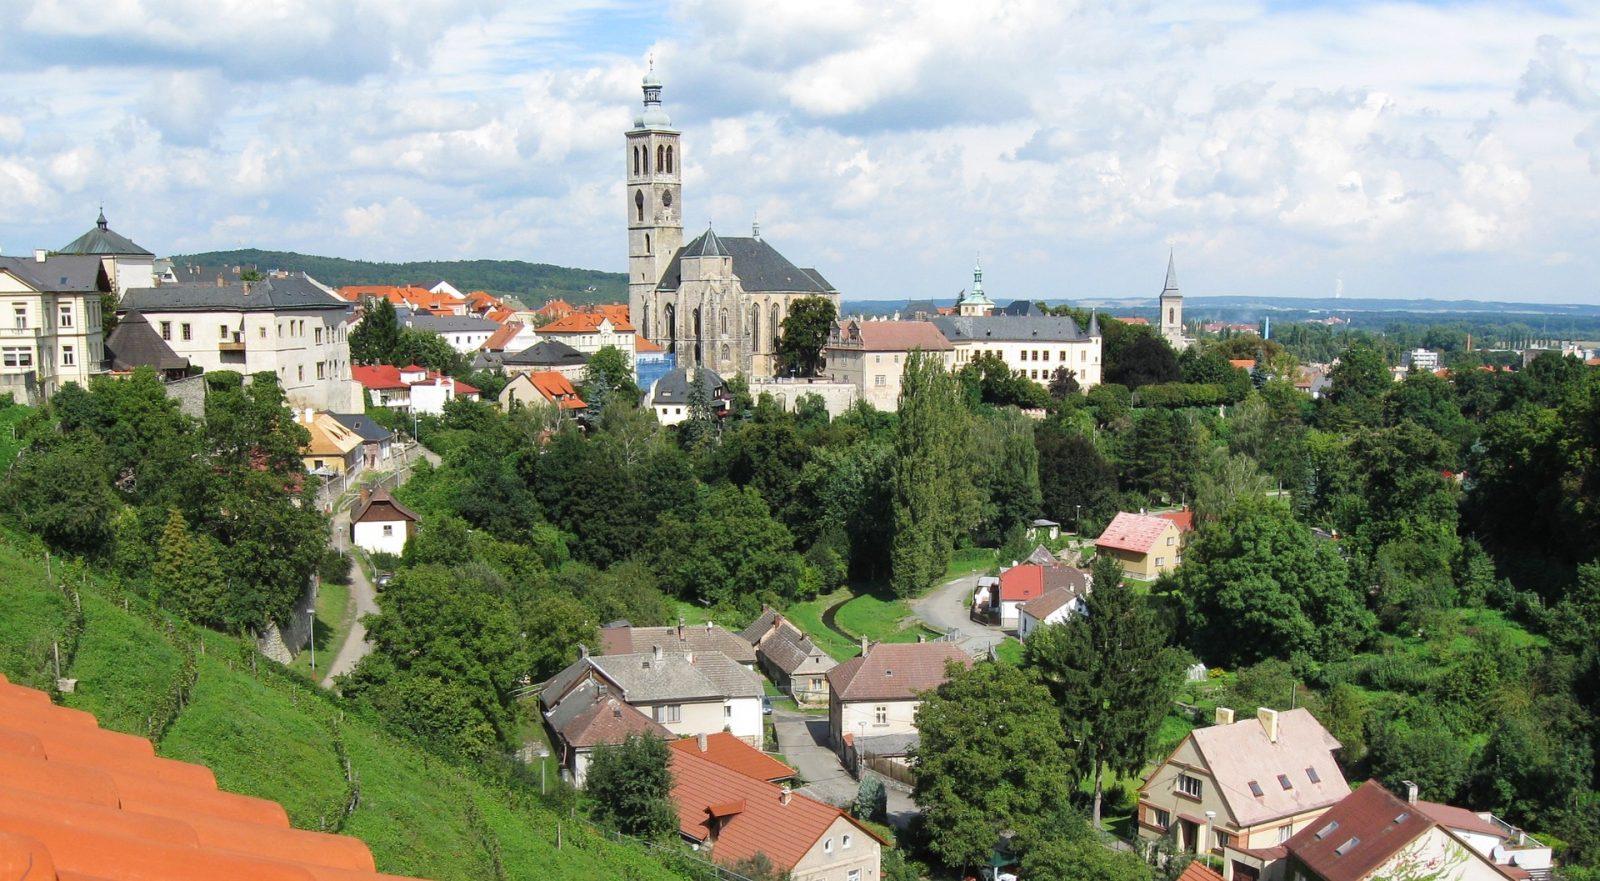 Kutna Hora UNESCO Site in the Czech Republic